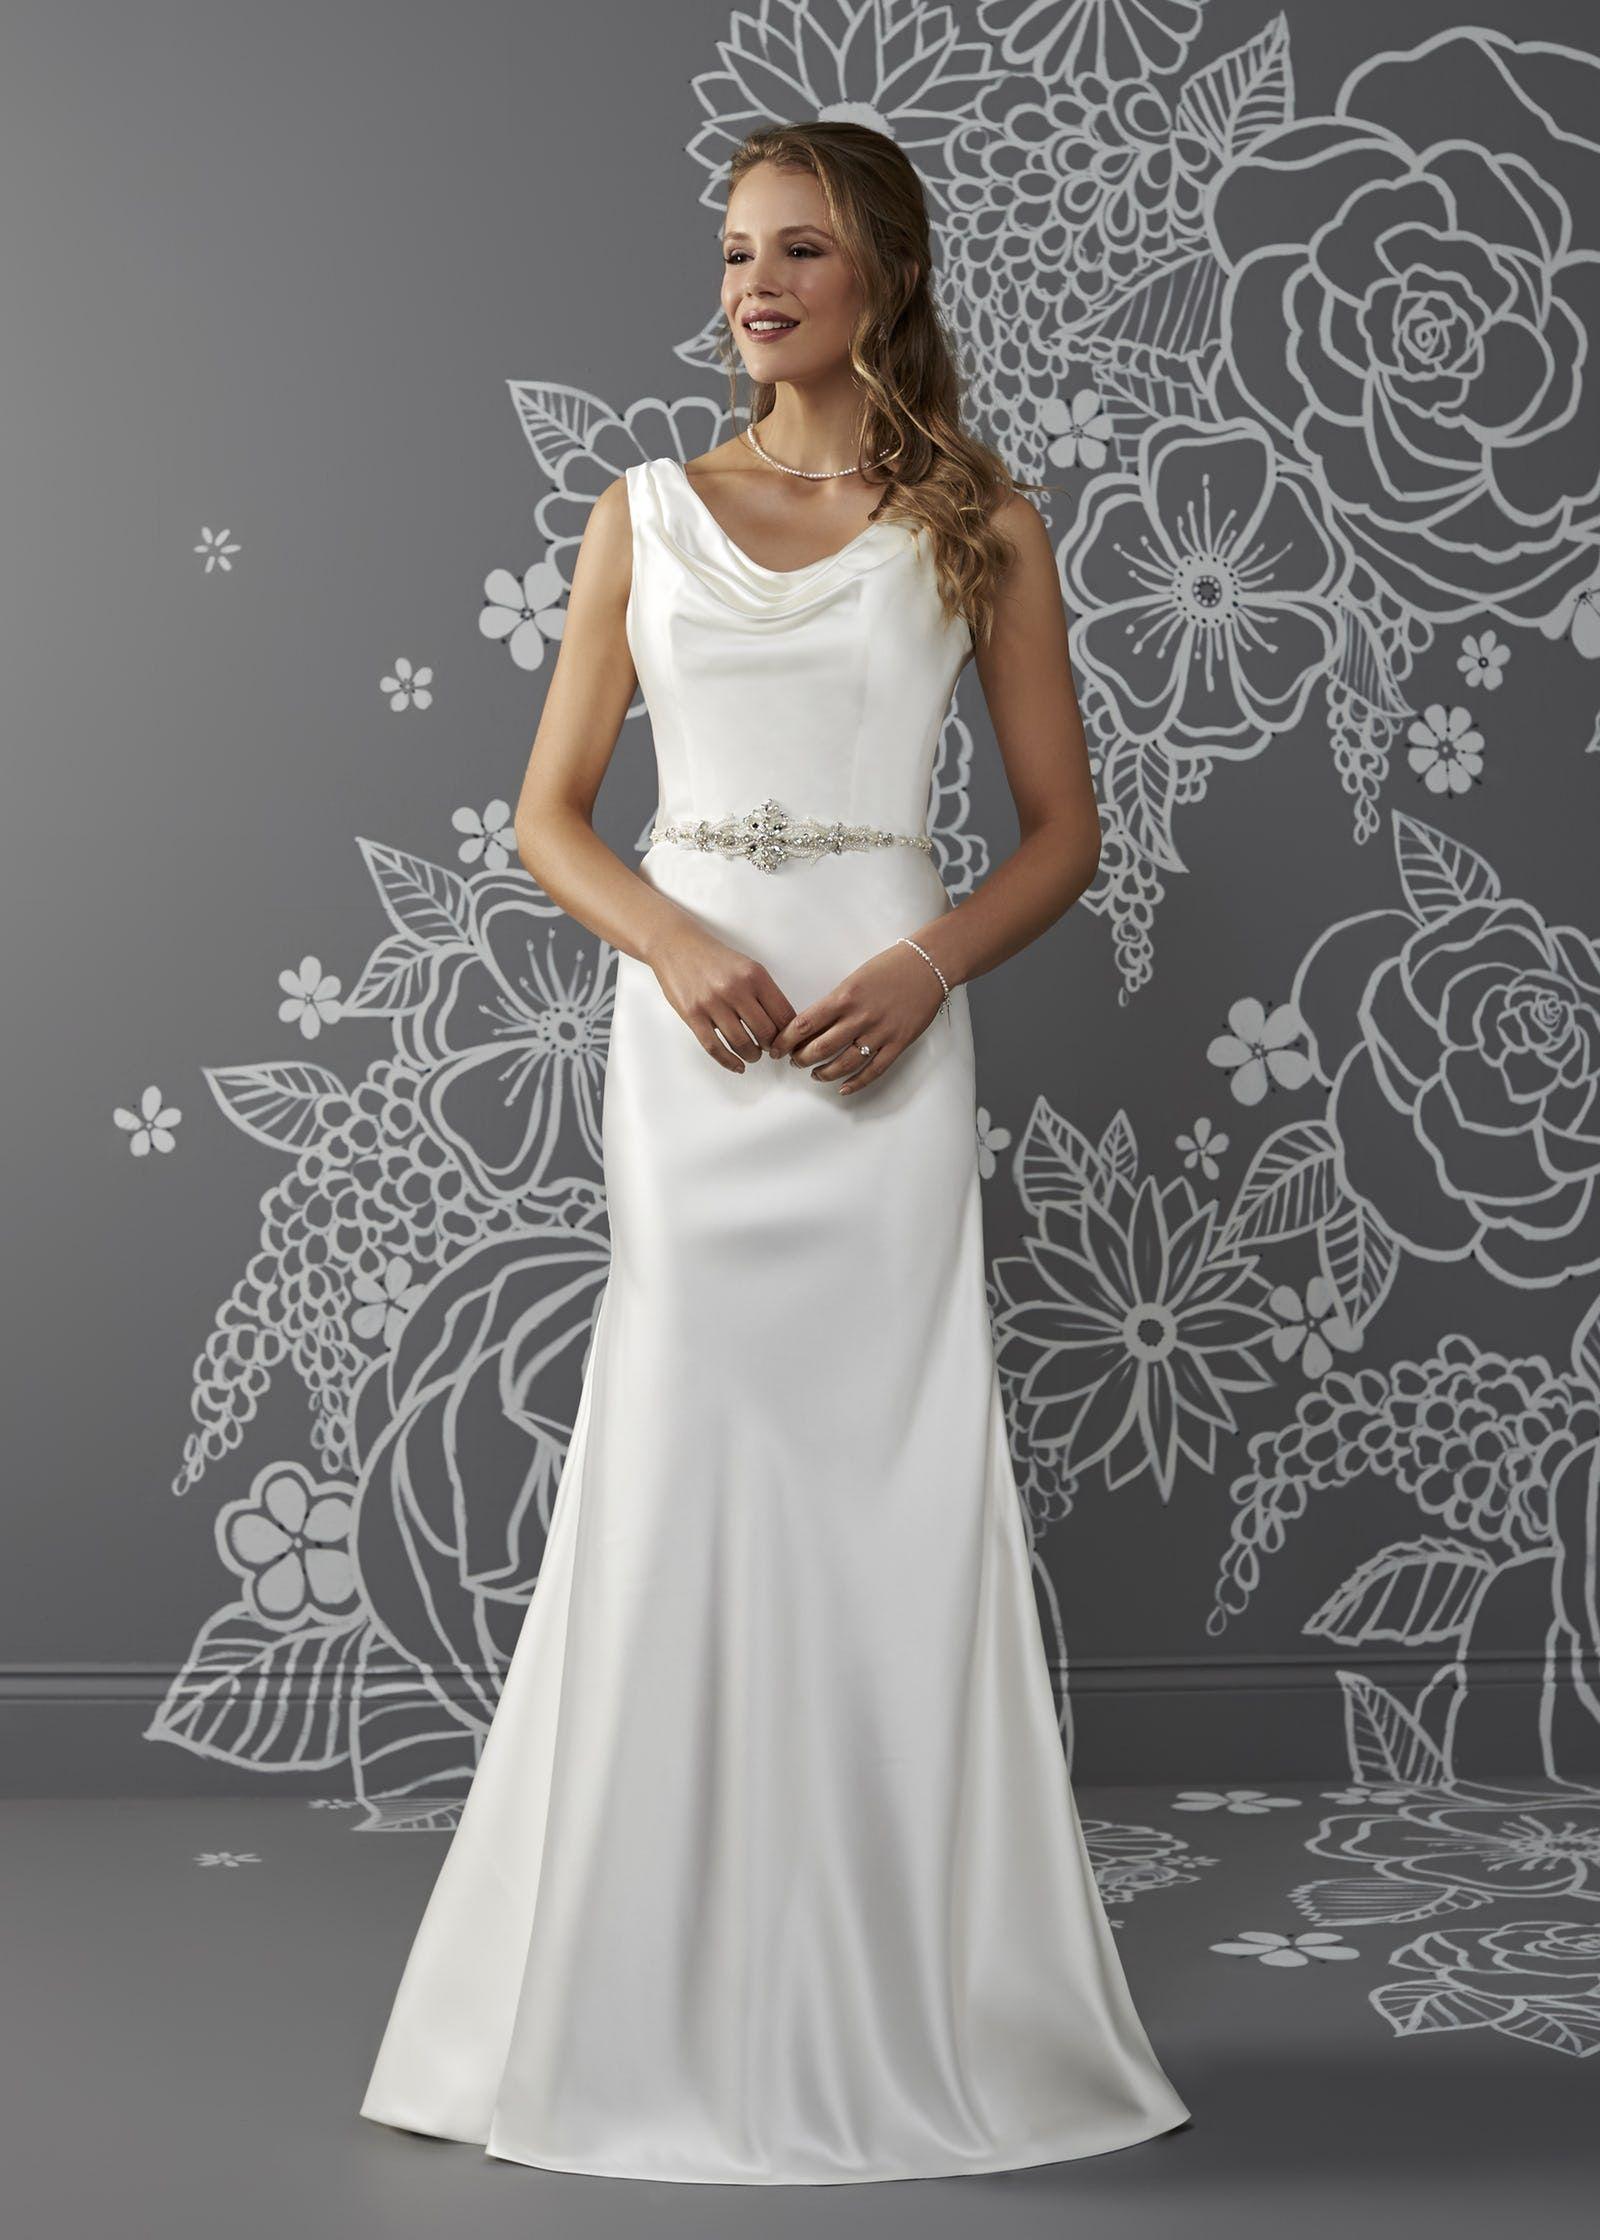 Informal wedding dresses for second marriage  Pin by Emma McLean on Wedding Dresses  Pinterest  Wedding dress